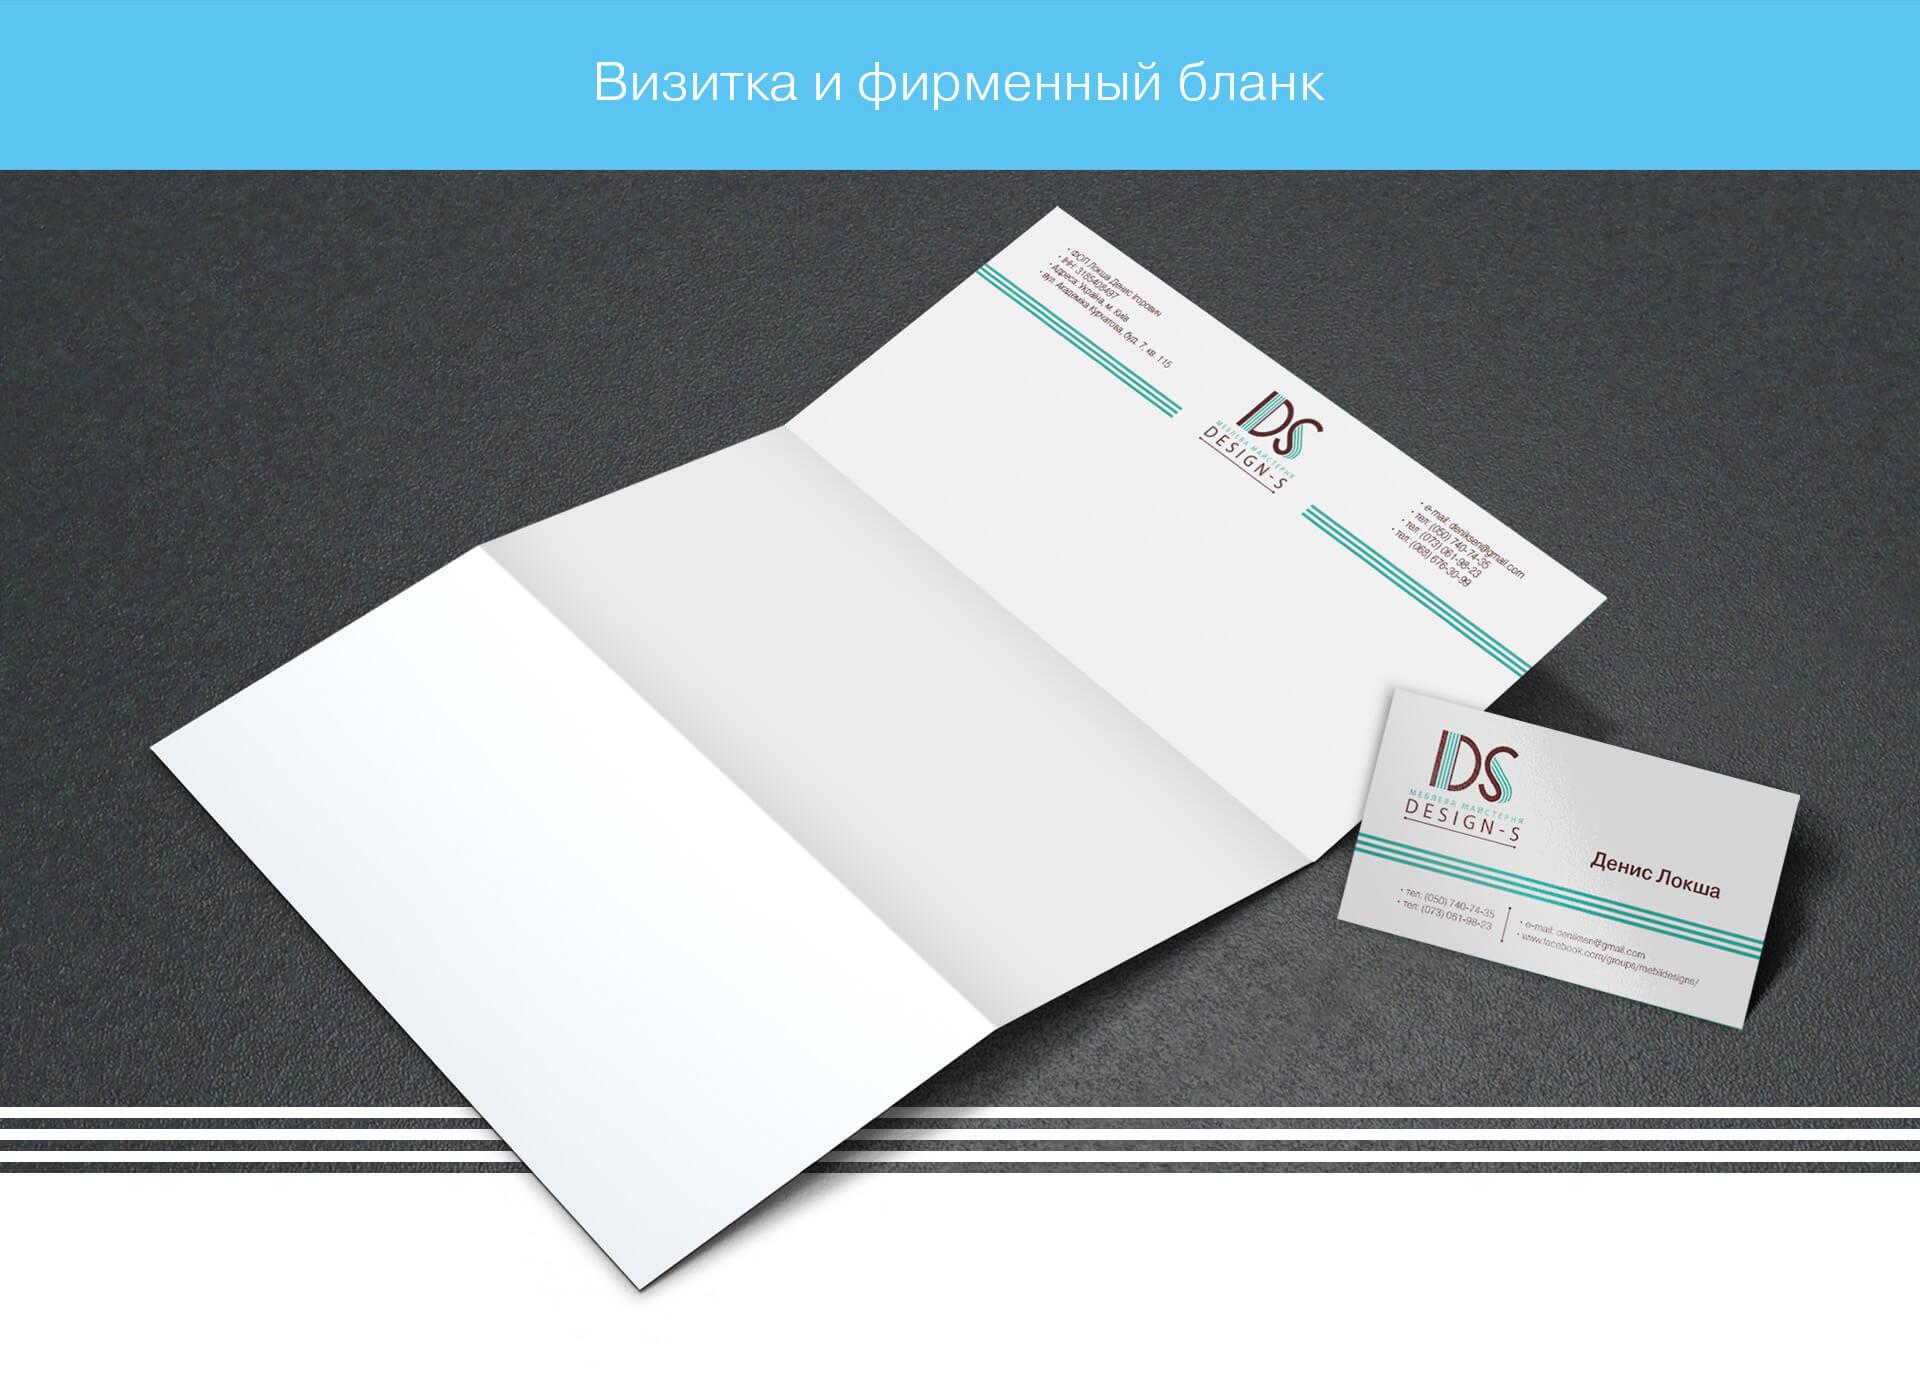 prokochuk_irina_design-s_5_